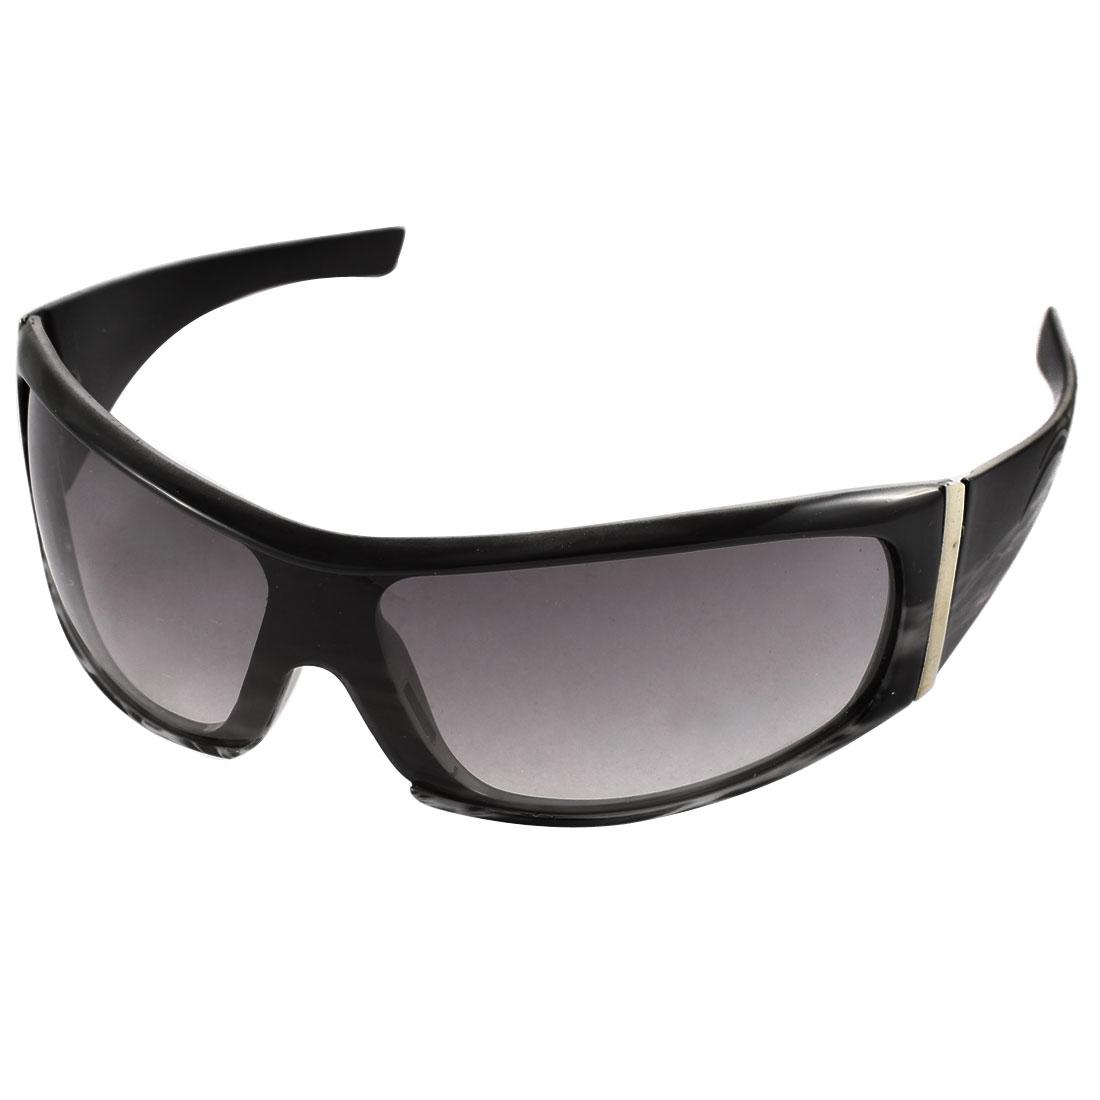 Men Full Rim Wide Temple Outdoor Sports Sunglasses Eyewear Black